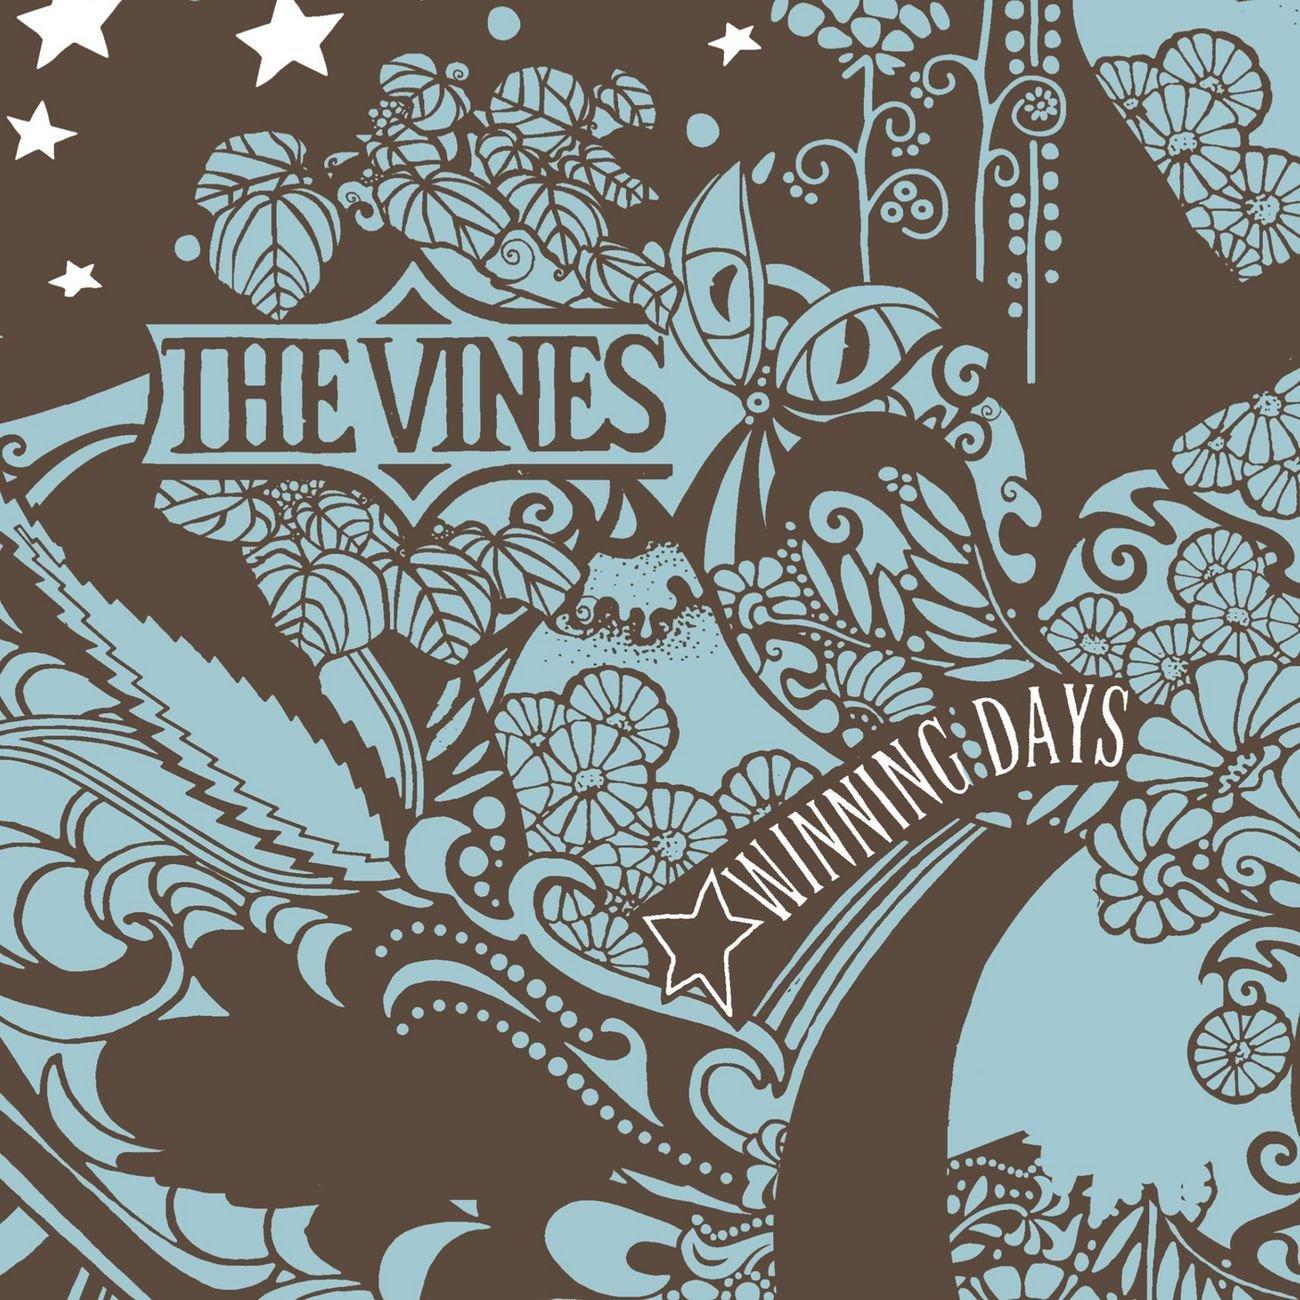 The Vines Vines. Winning Days